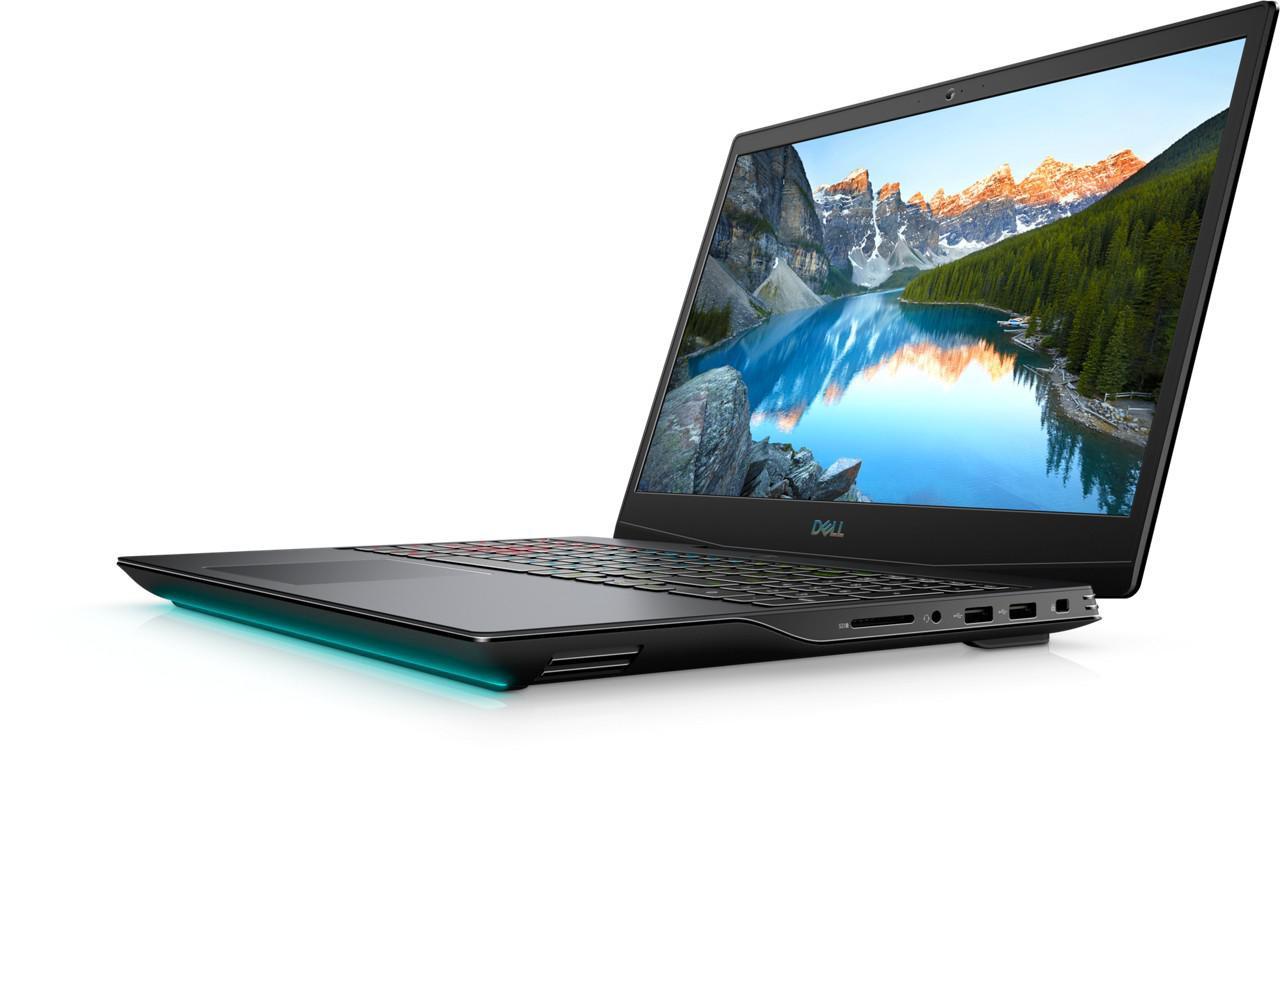 "Laptop Dell Inspiron Gaming 5500 G5, 15.6"" FHD, i7-10750H, 16GB, 1TB SSD, GeForce RTX 2060, Ubuntu - imaginea 8"